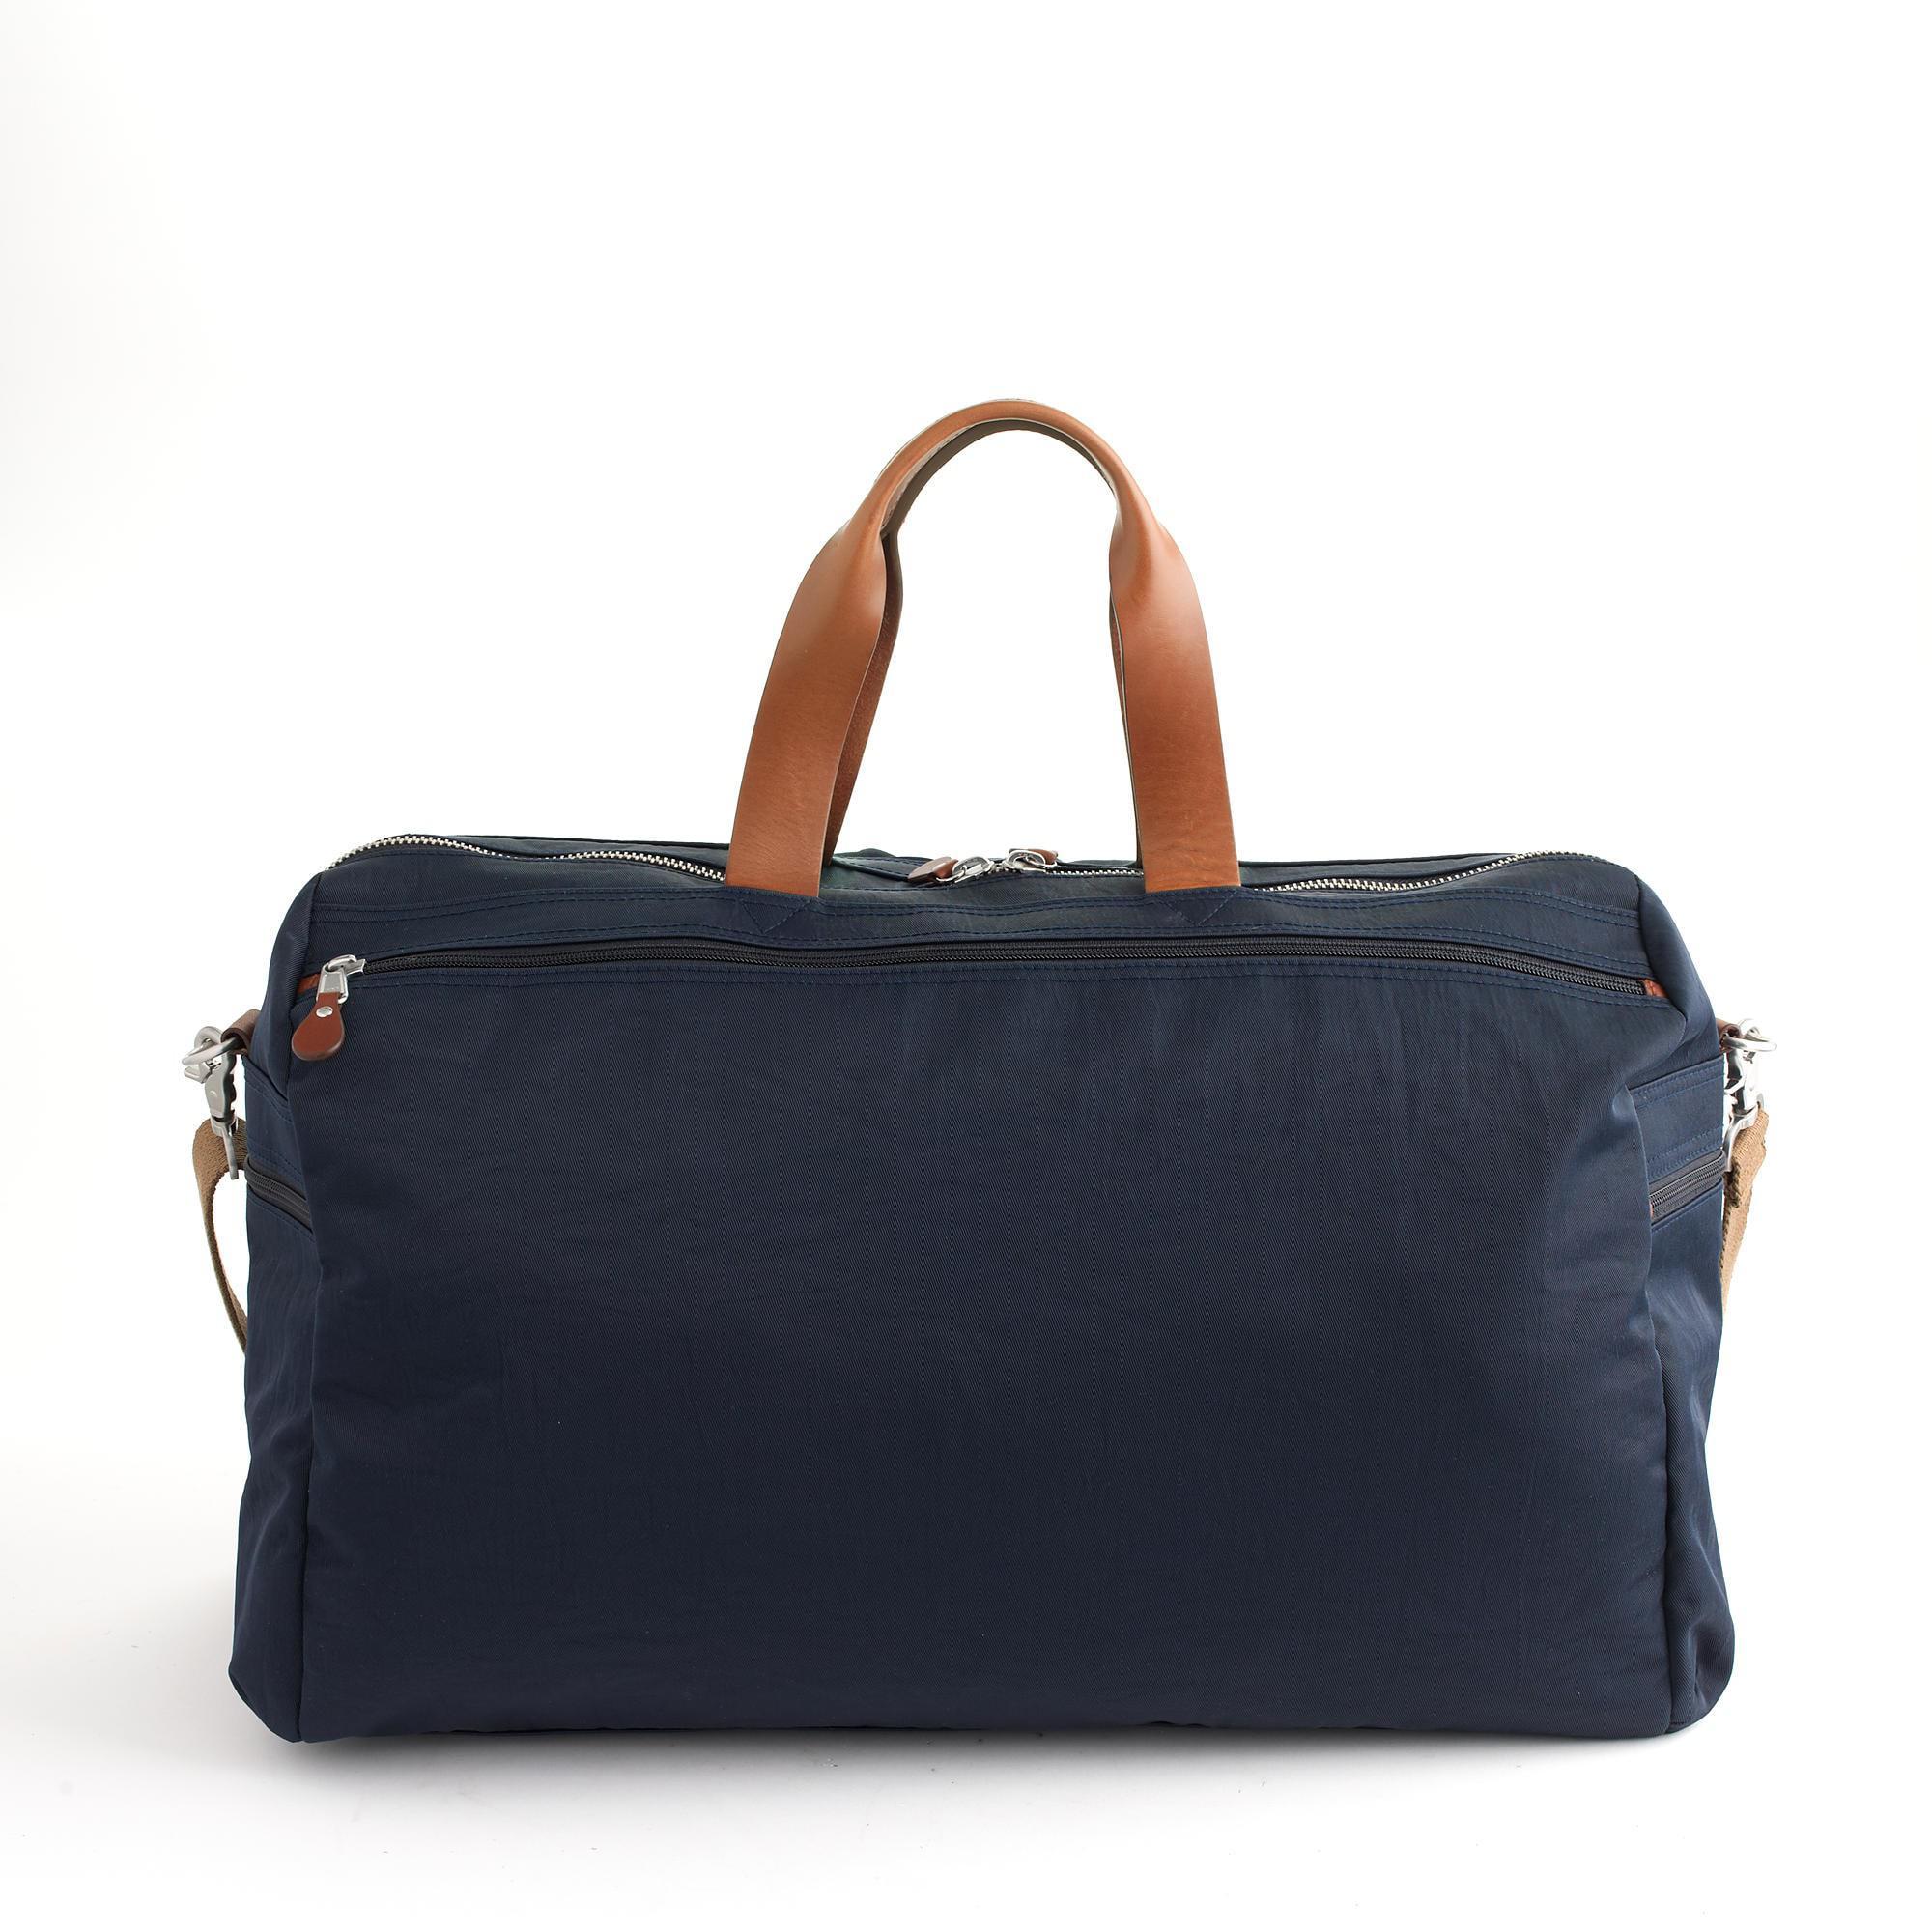 bca1b12a9d Lyst - J.Crew Harwick Weekender Bag in Blue for Men